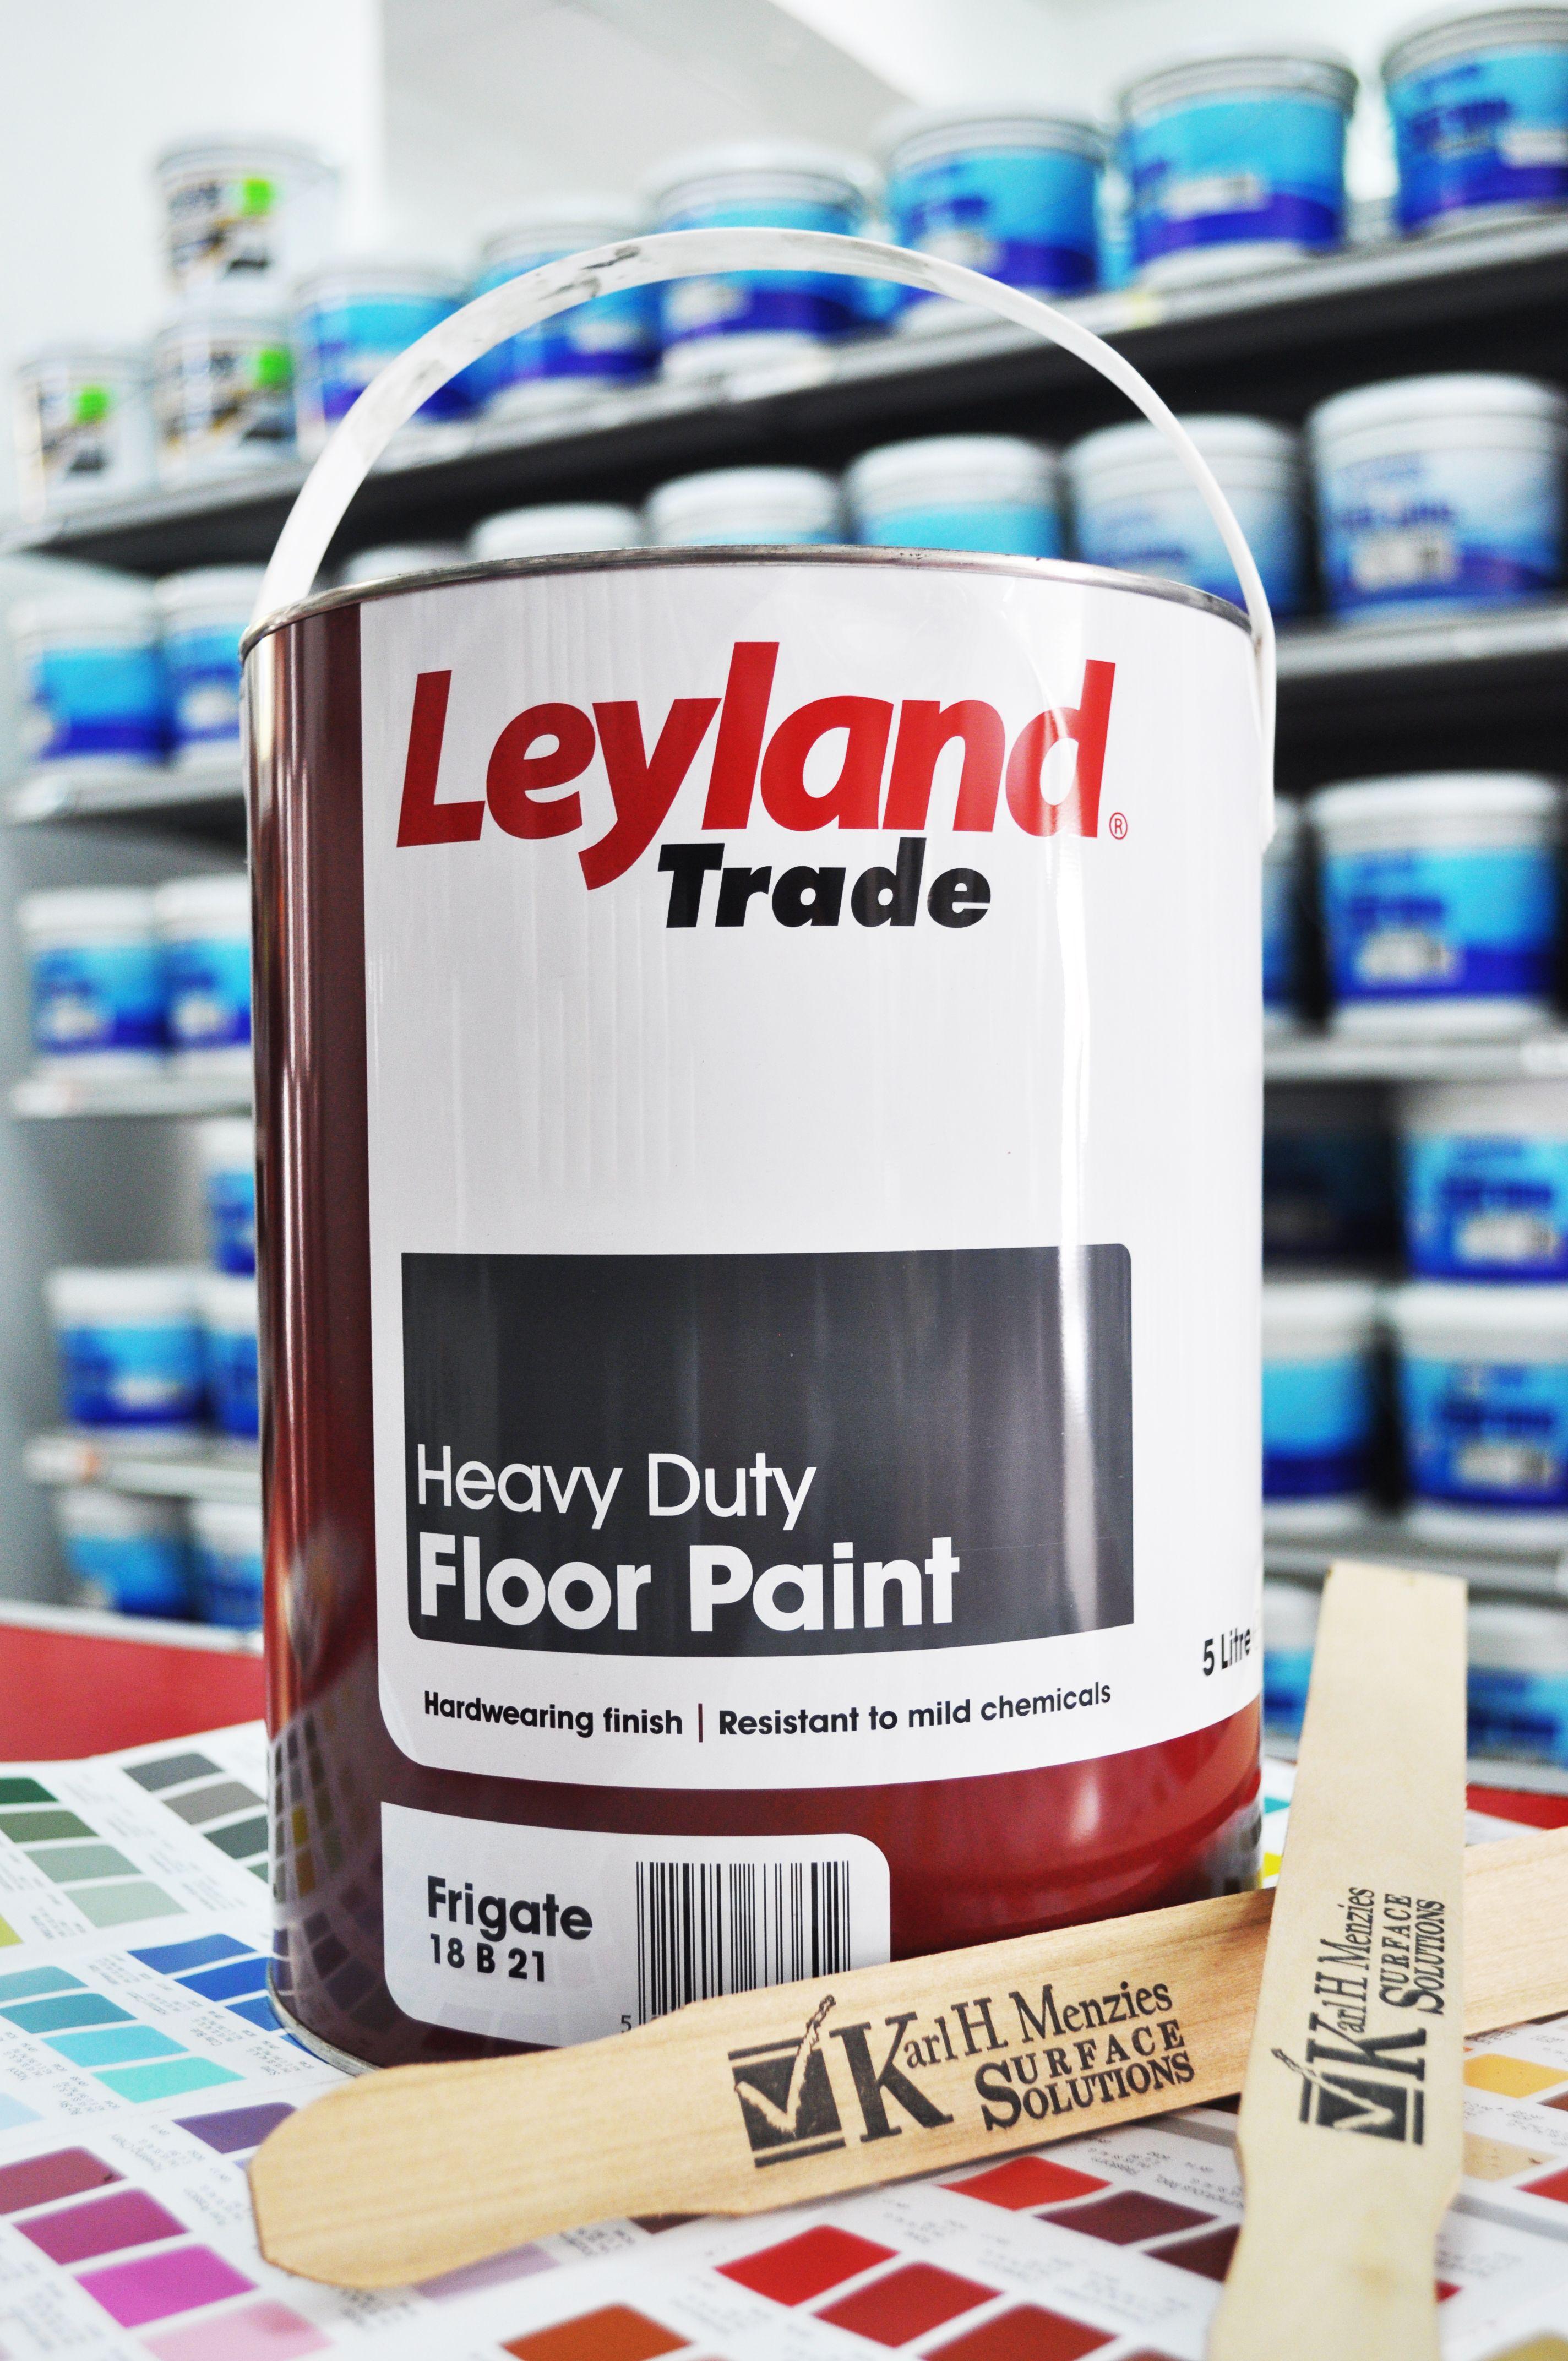 Leyland paints colour chart - Leyland Heavy Duty Floor Paint